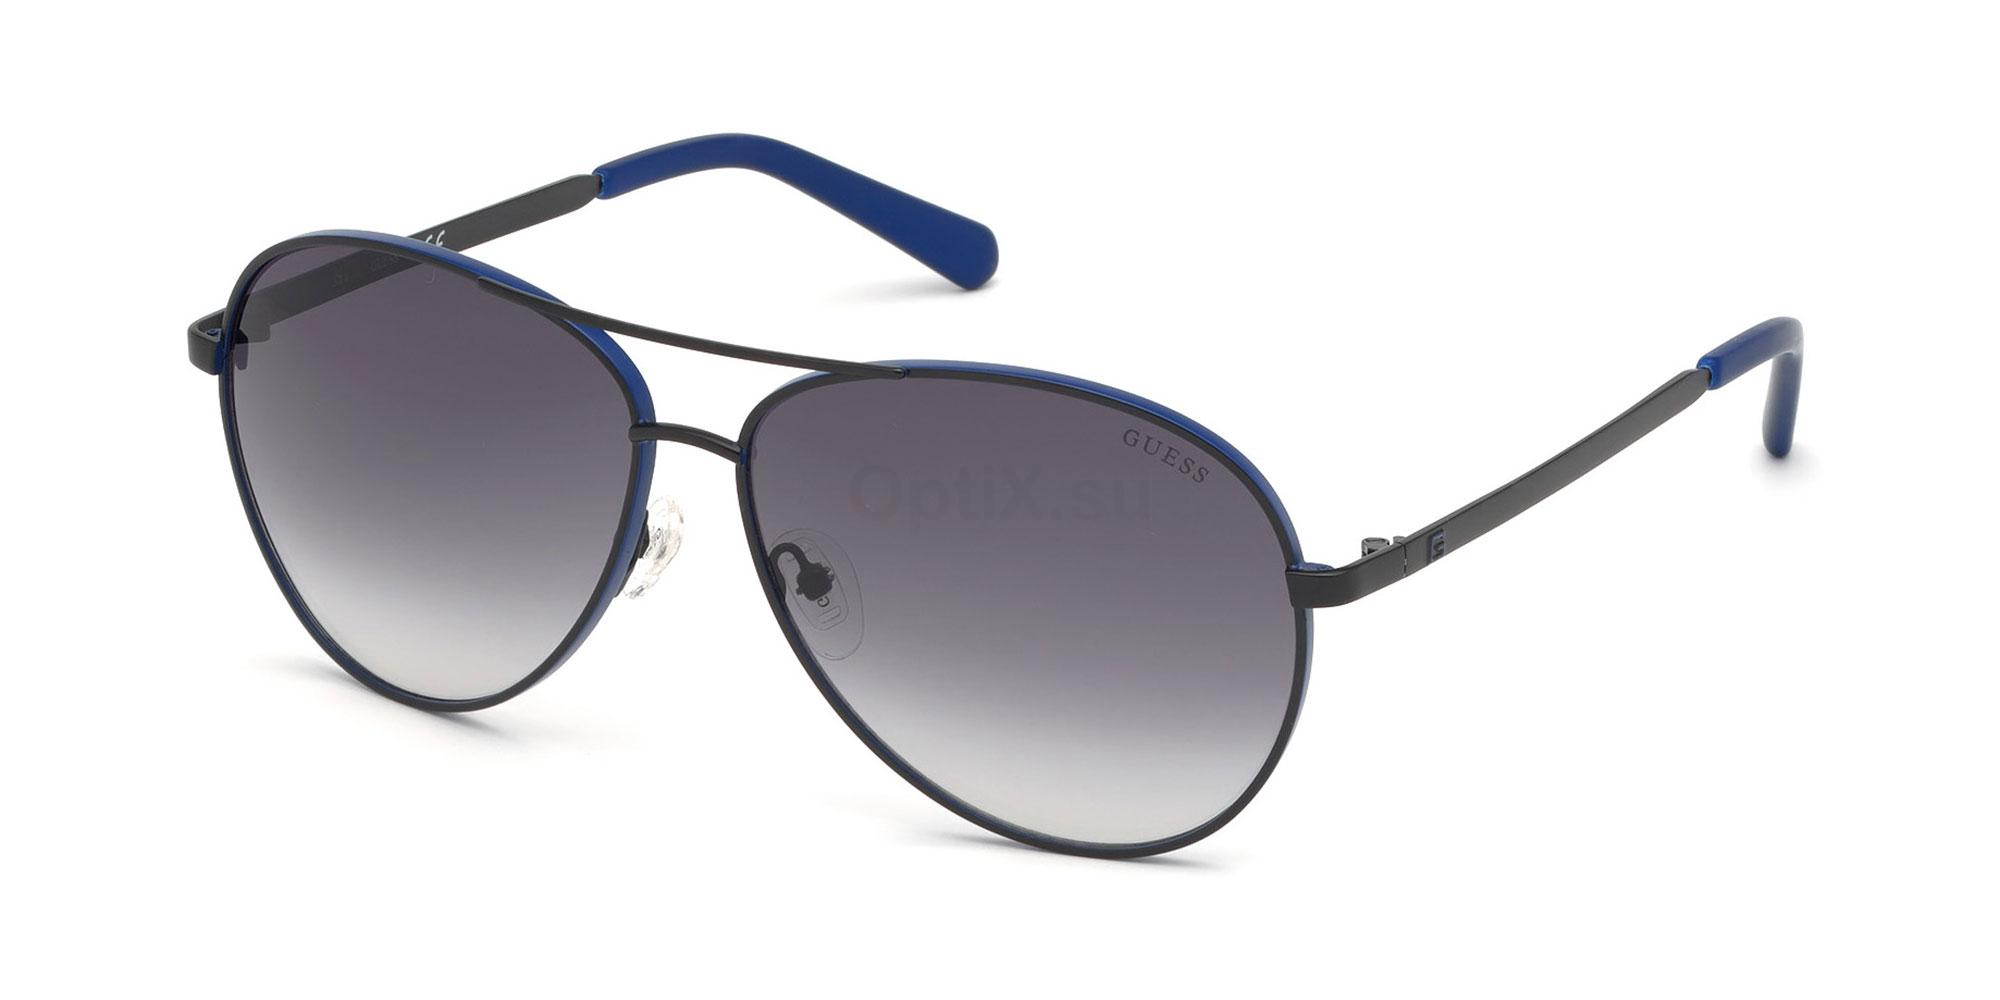 02B GU6948 Sunglasses, Guess